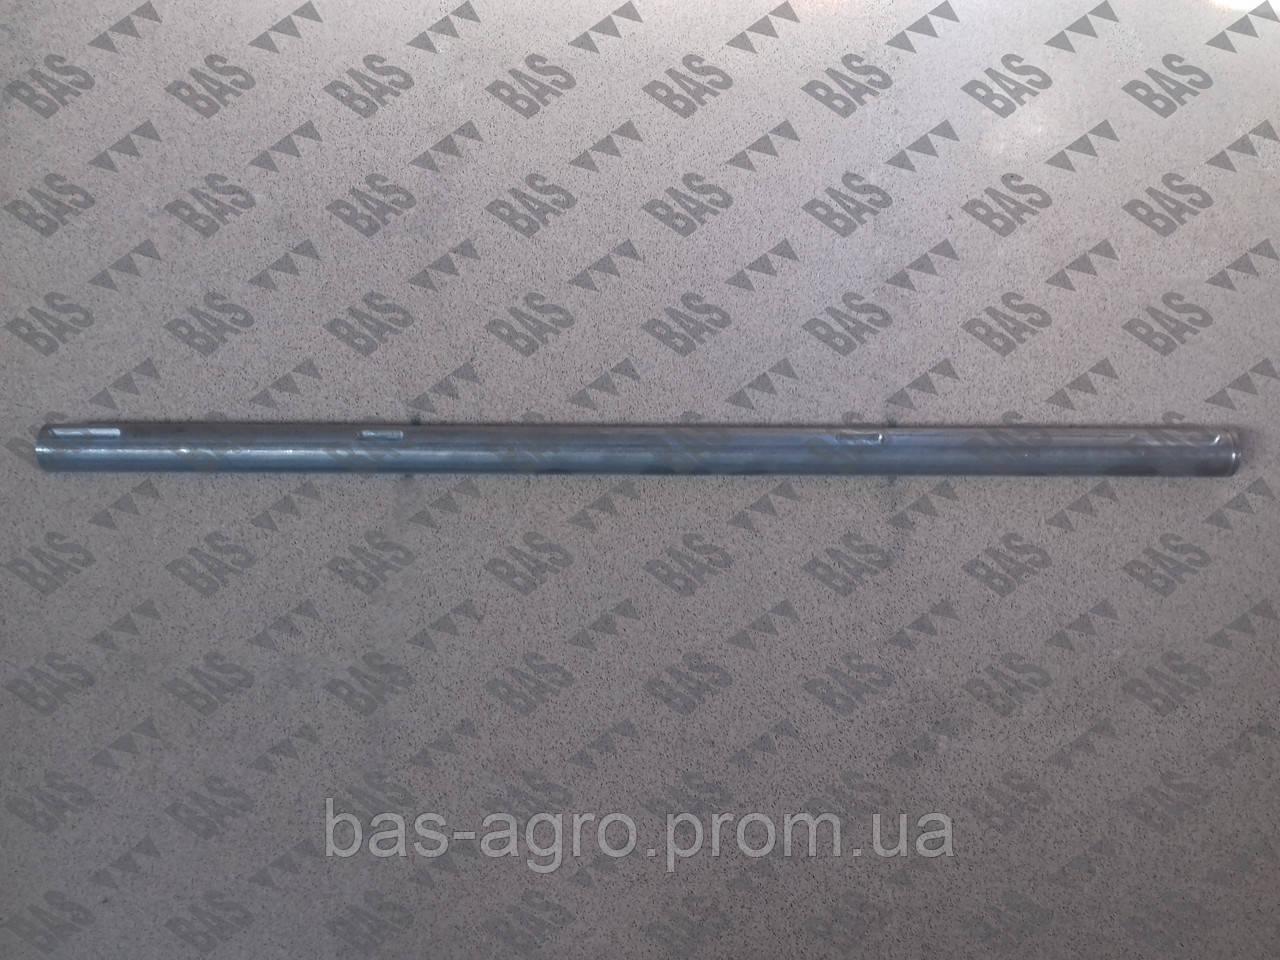 Вал L-725 Fantini 02424/GS87516/70 аналог